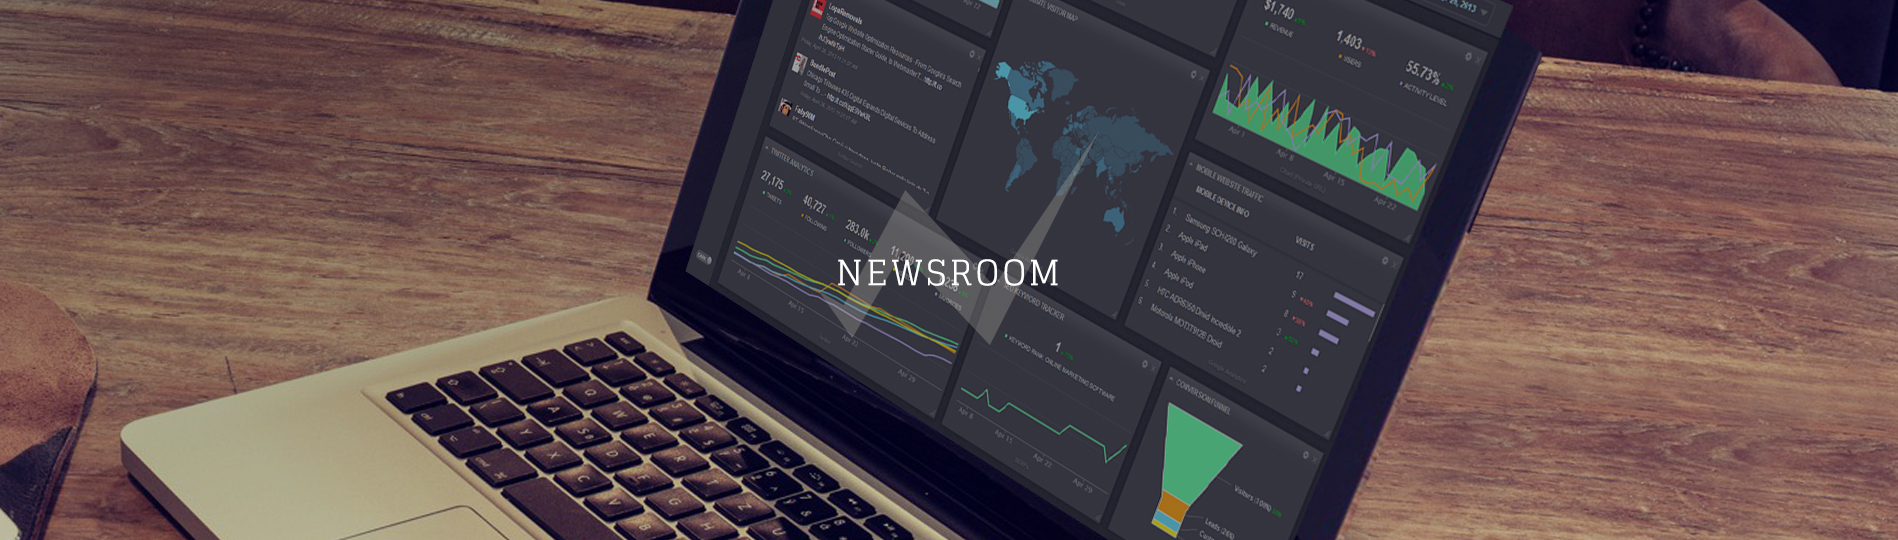 Capabilities_News-Room.jpg